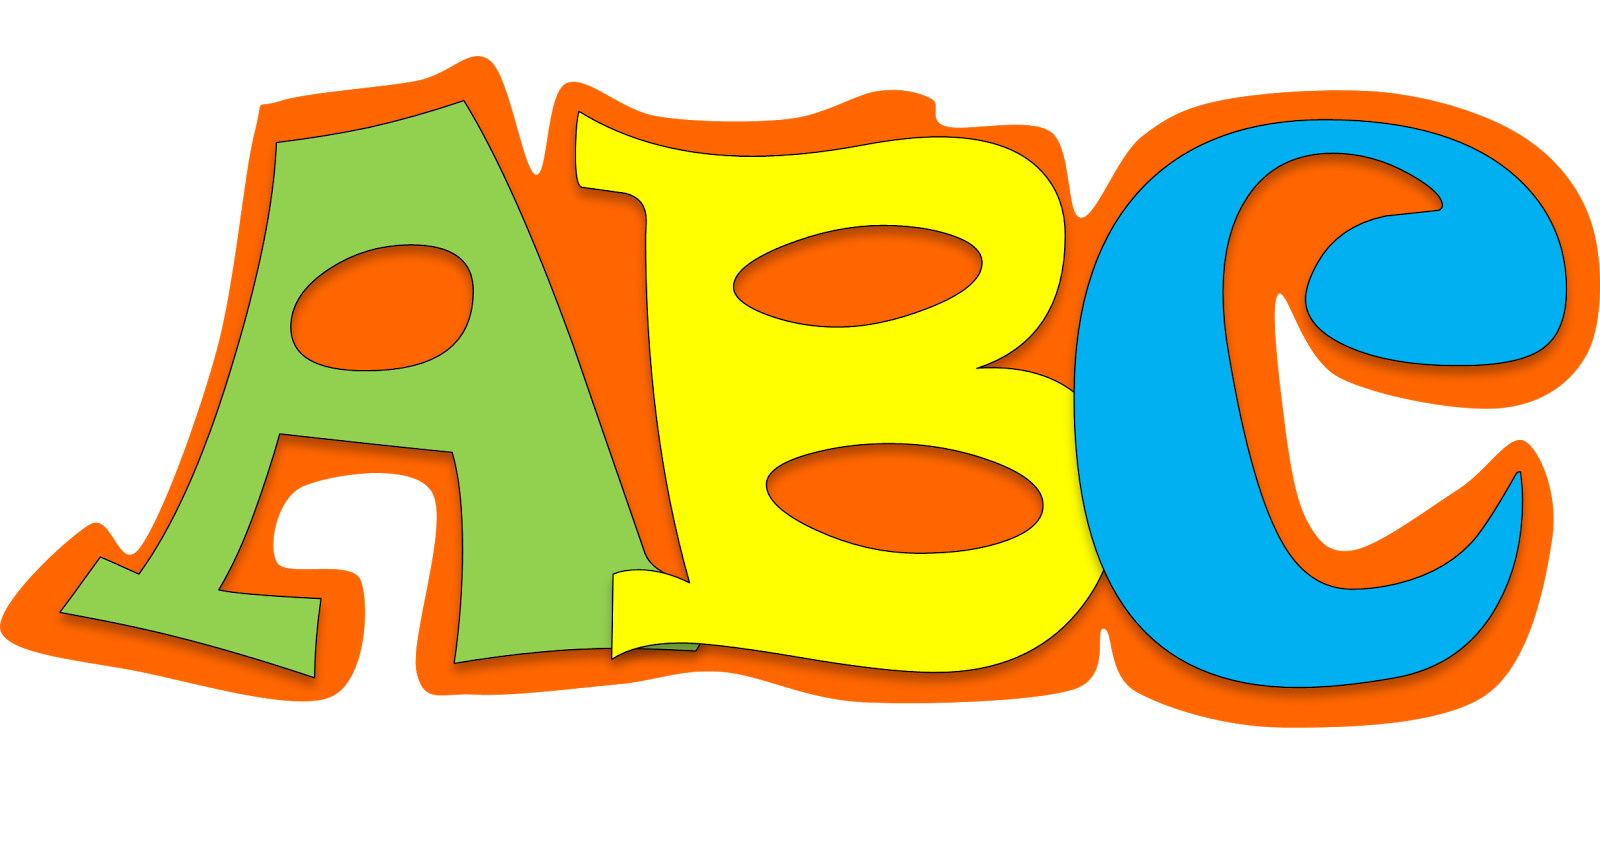 Abc Clipart-Abc Clipart-10